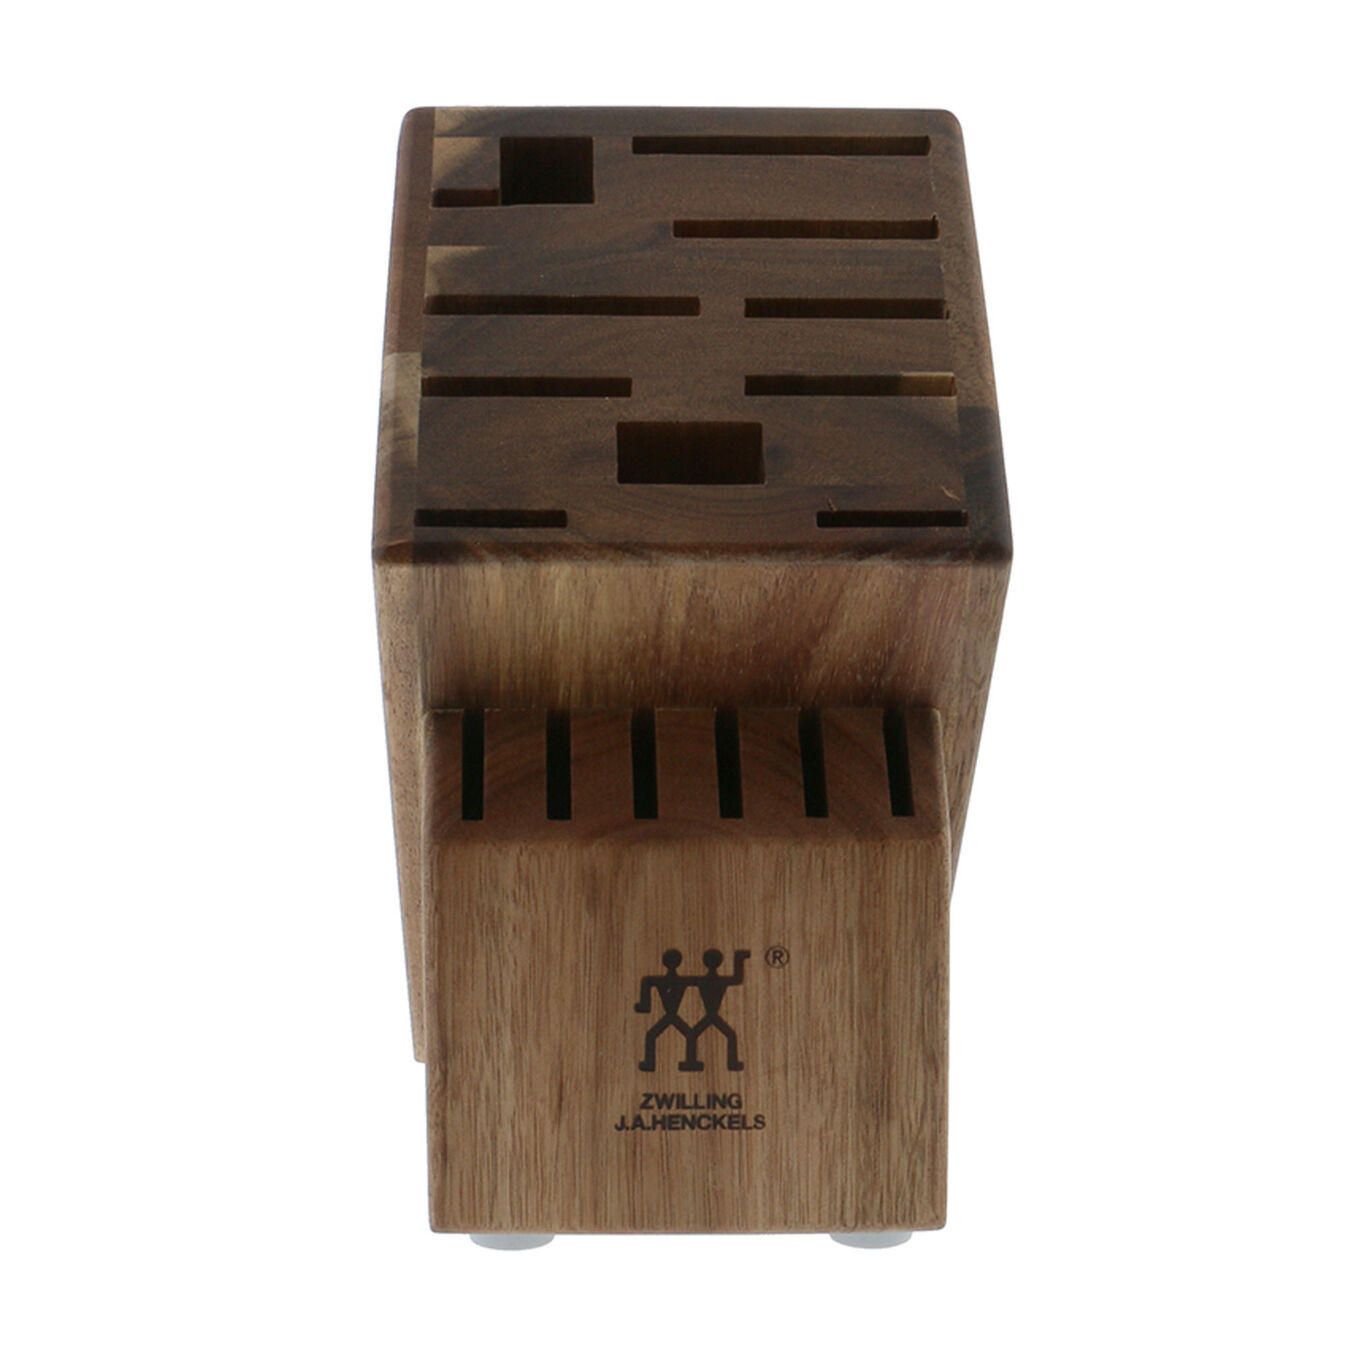 Acacia 16-slot block,,large 2